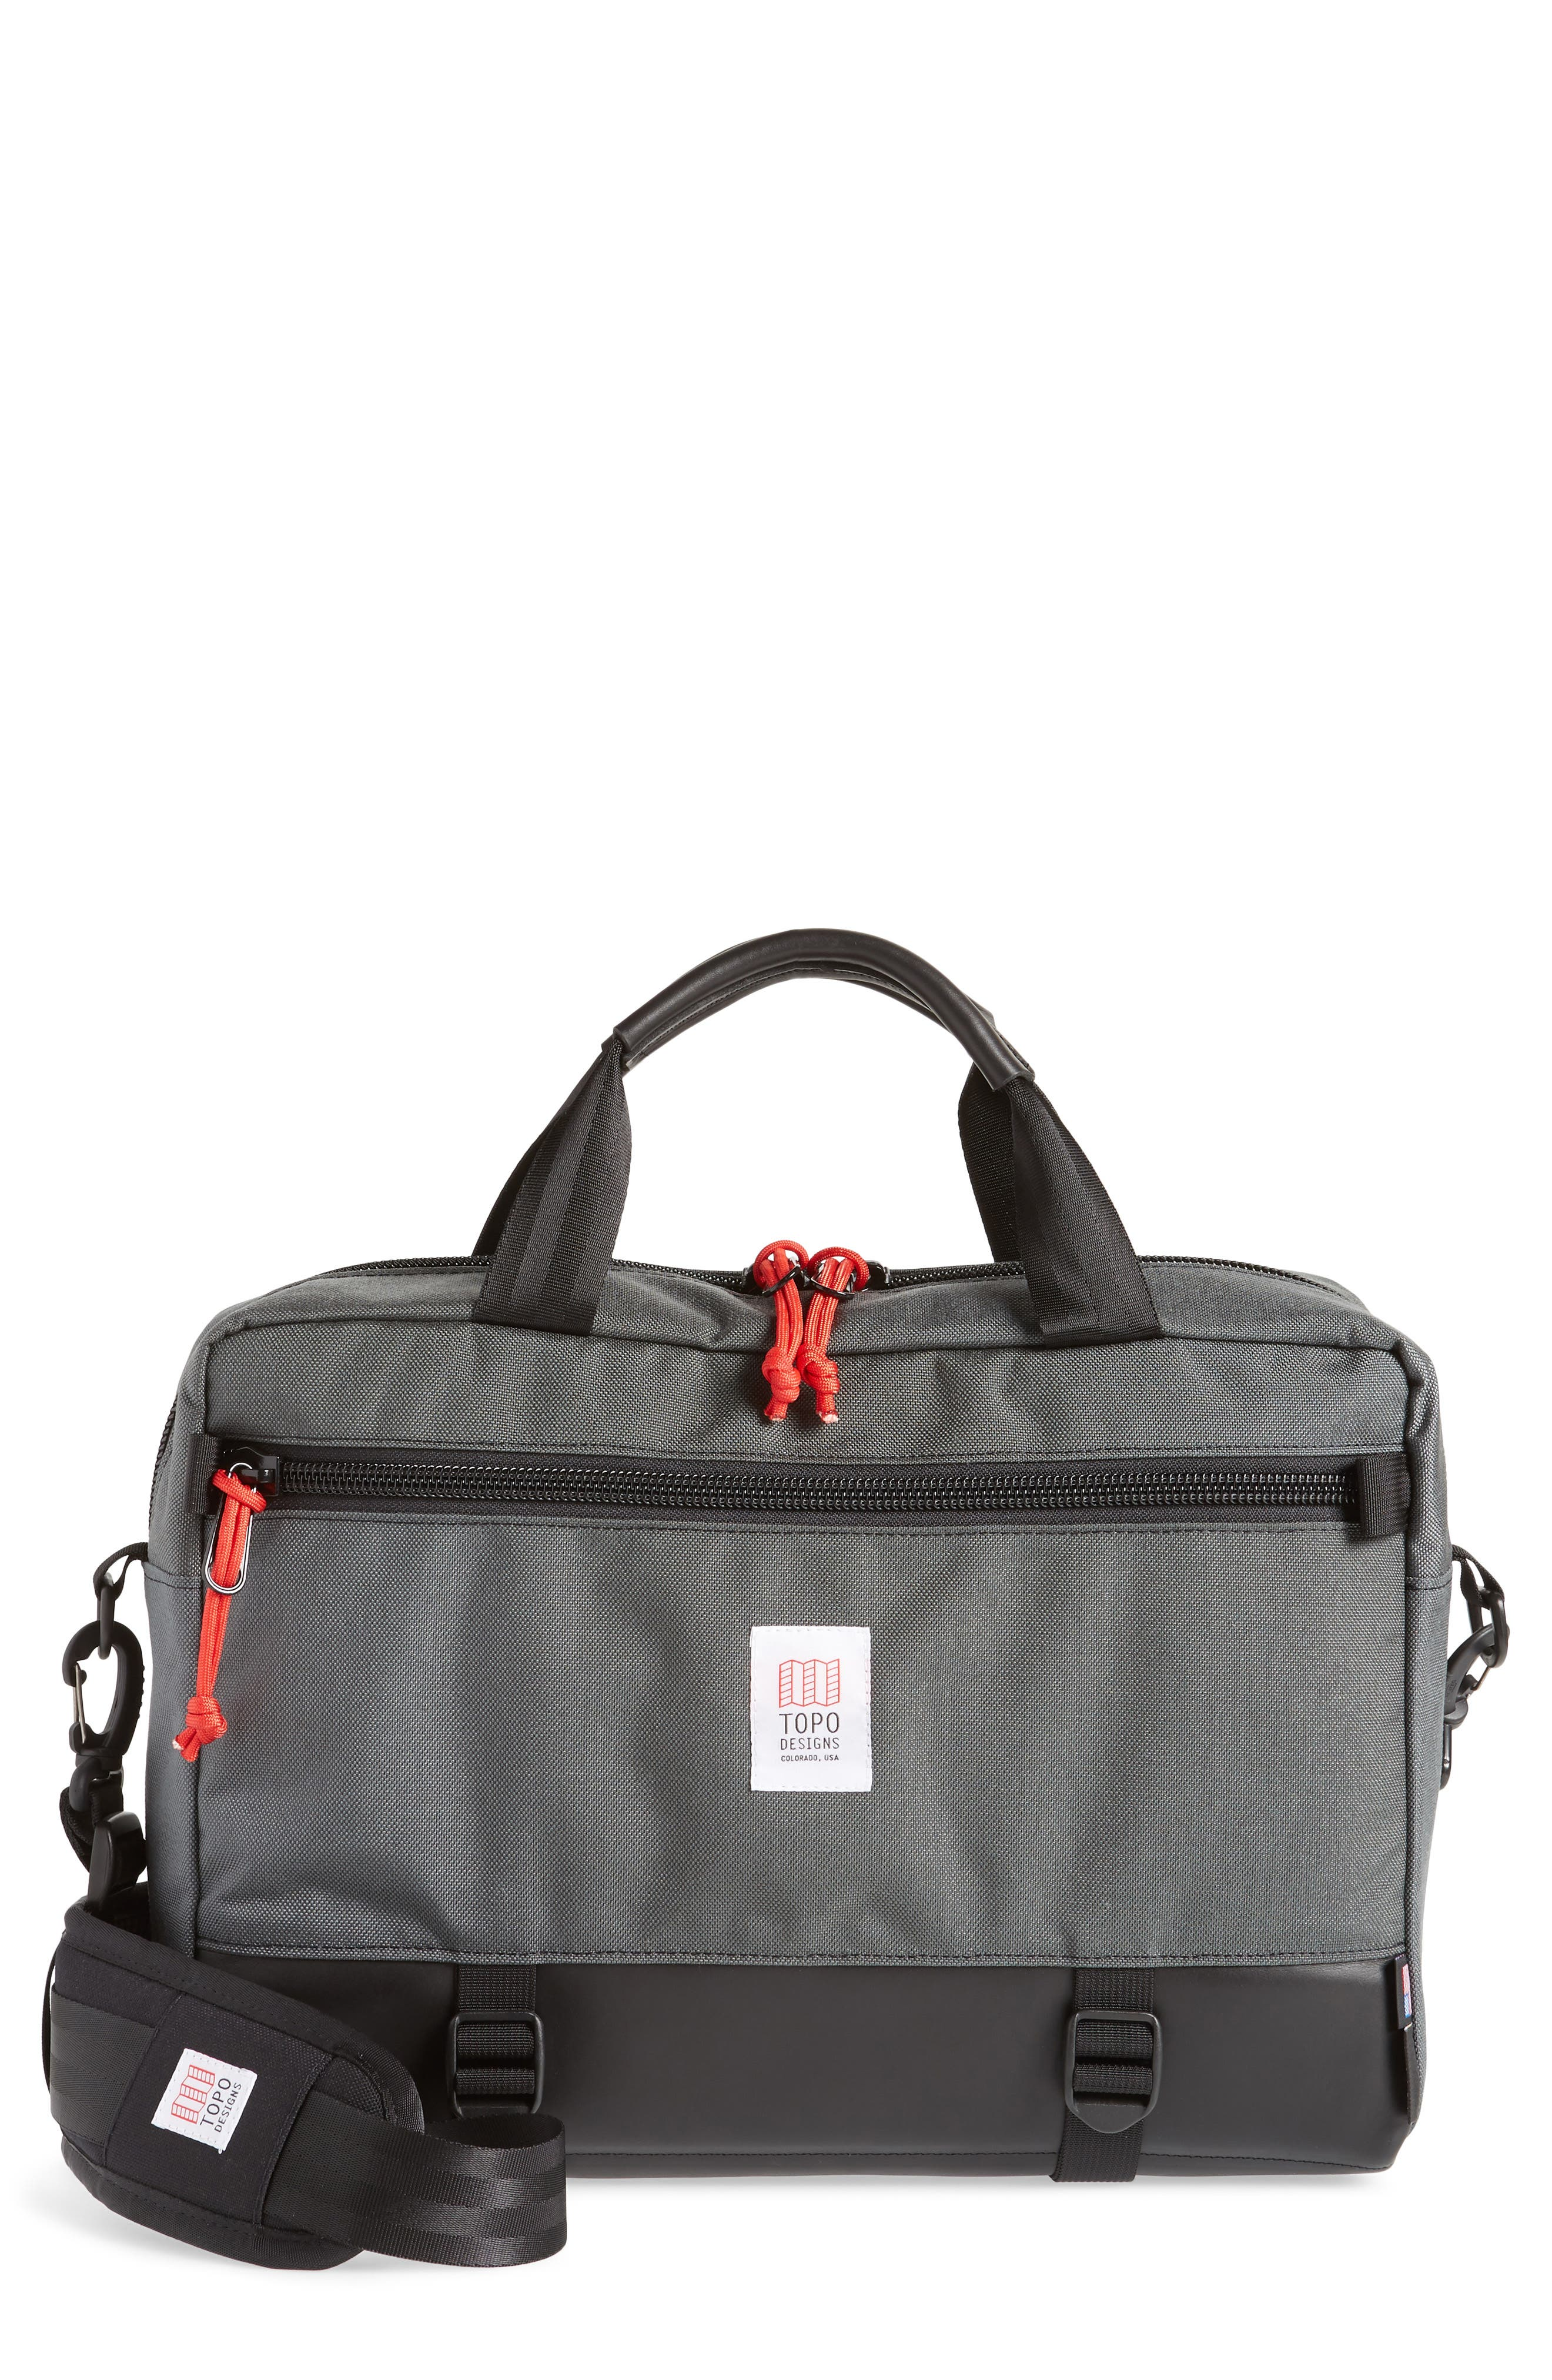 TOPO DESIGNS 'Commuter' Briefcase, Main, color, CHARCOAL/BLACK LEATHER